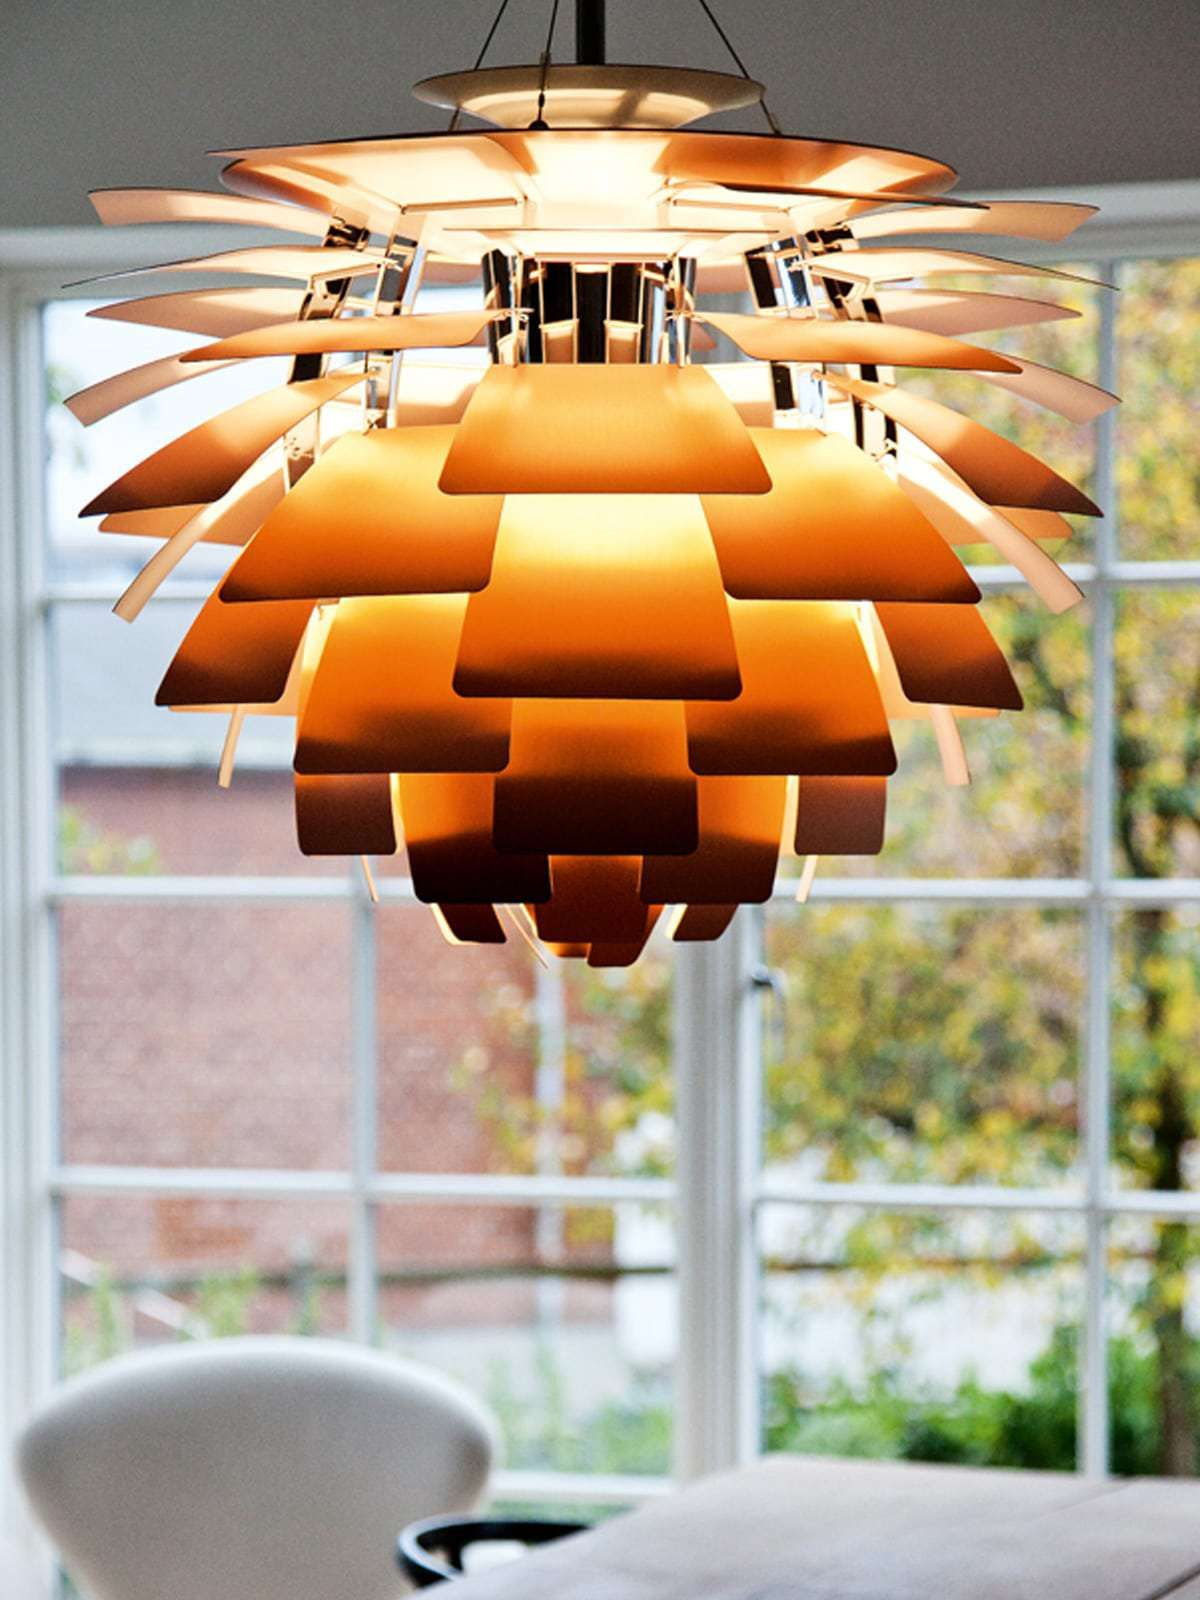 PH Artichoke in Kupfer  Lampen wohnzimmer, Design lampen, Lampen